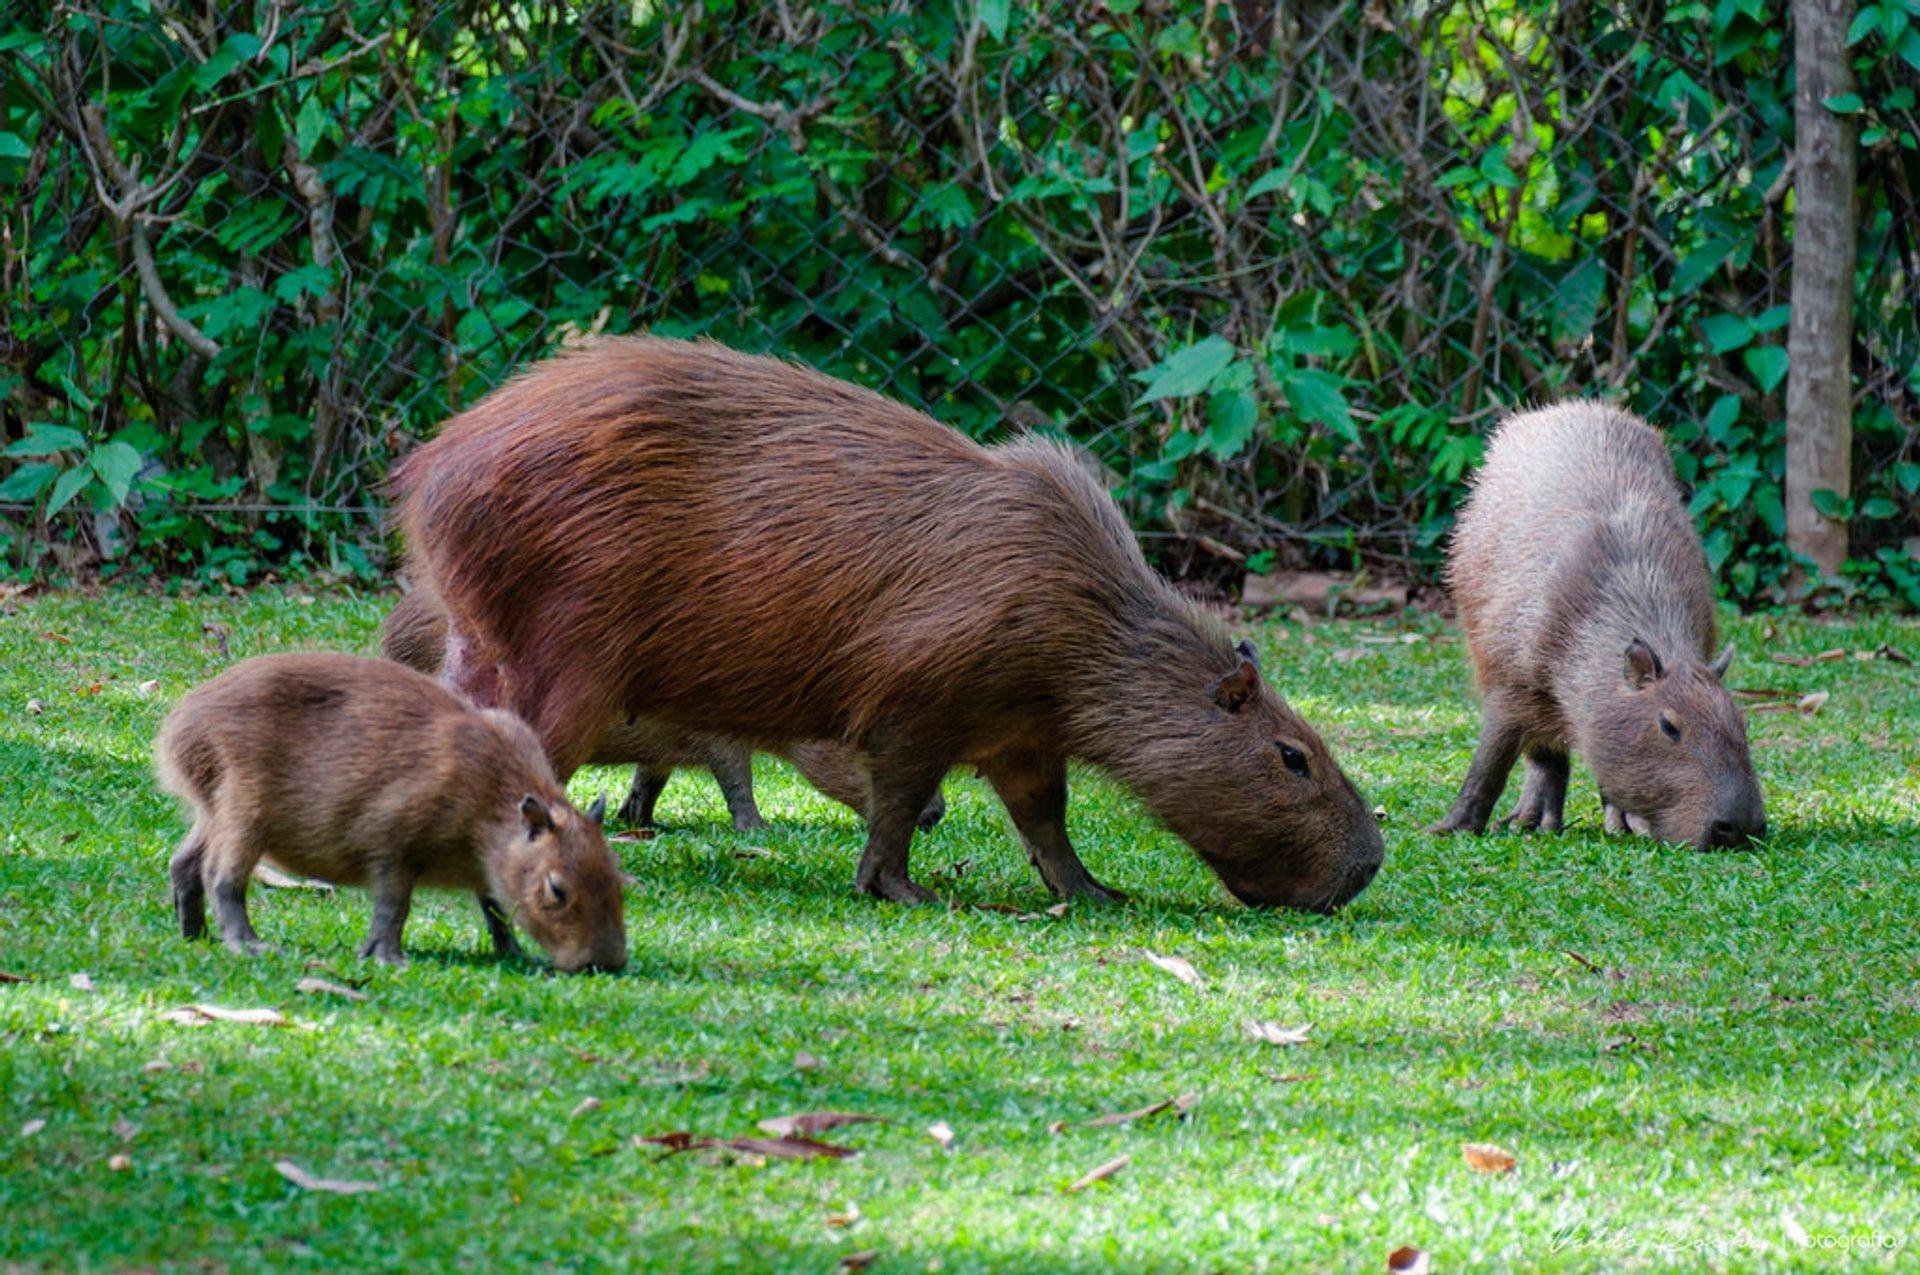 Capybara Watching (Breeding Season) in Rio de Janeiro 2020 - Best Time